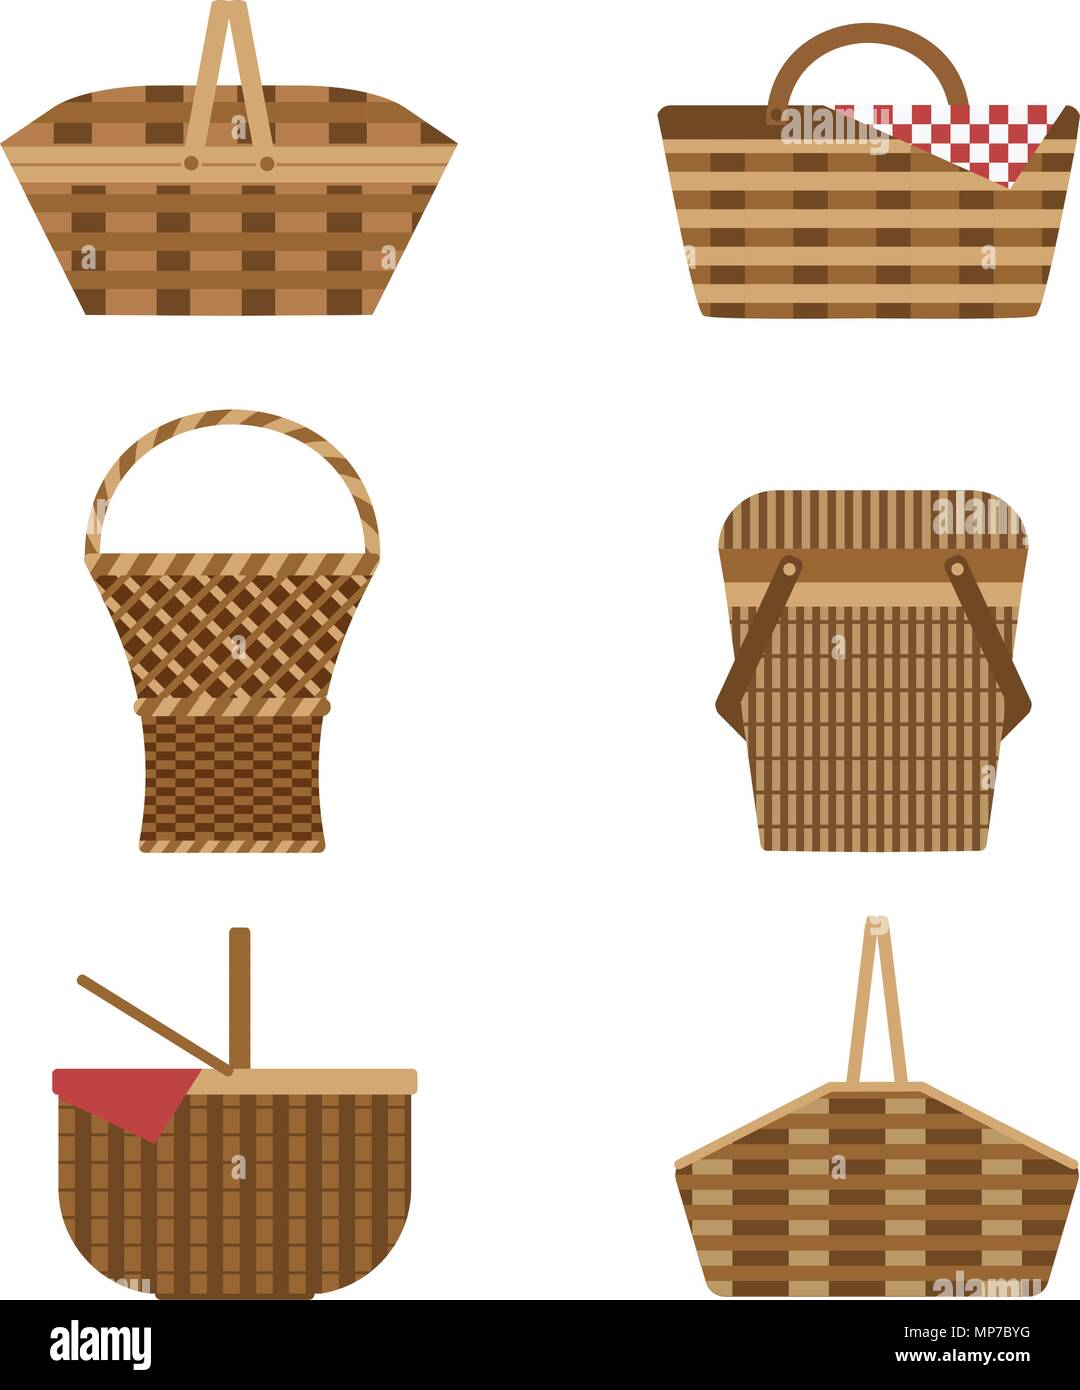 Wicker Picnic Baskets Set - Stock Vector